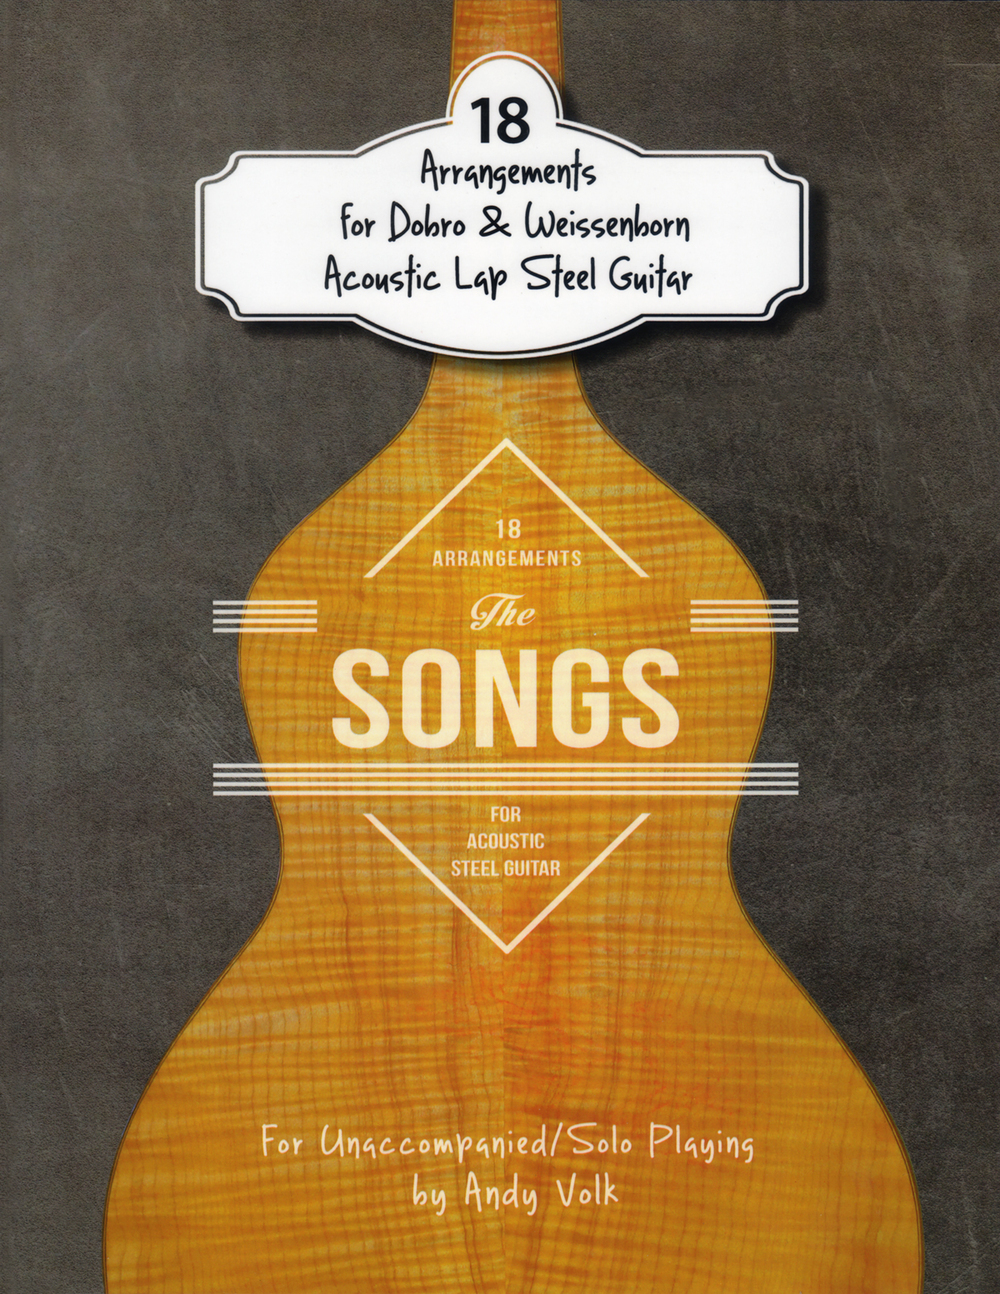 18 Arrangements for Dobro & Weissenborn Acoustic Lap Steel Guitar